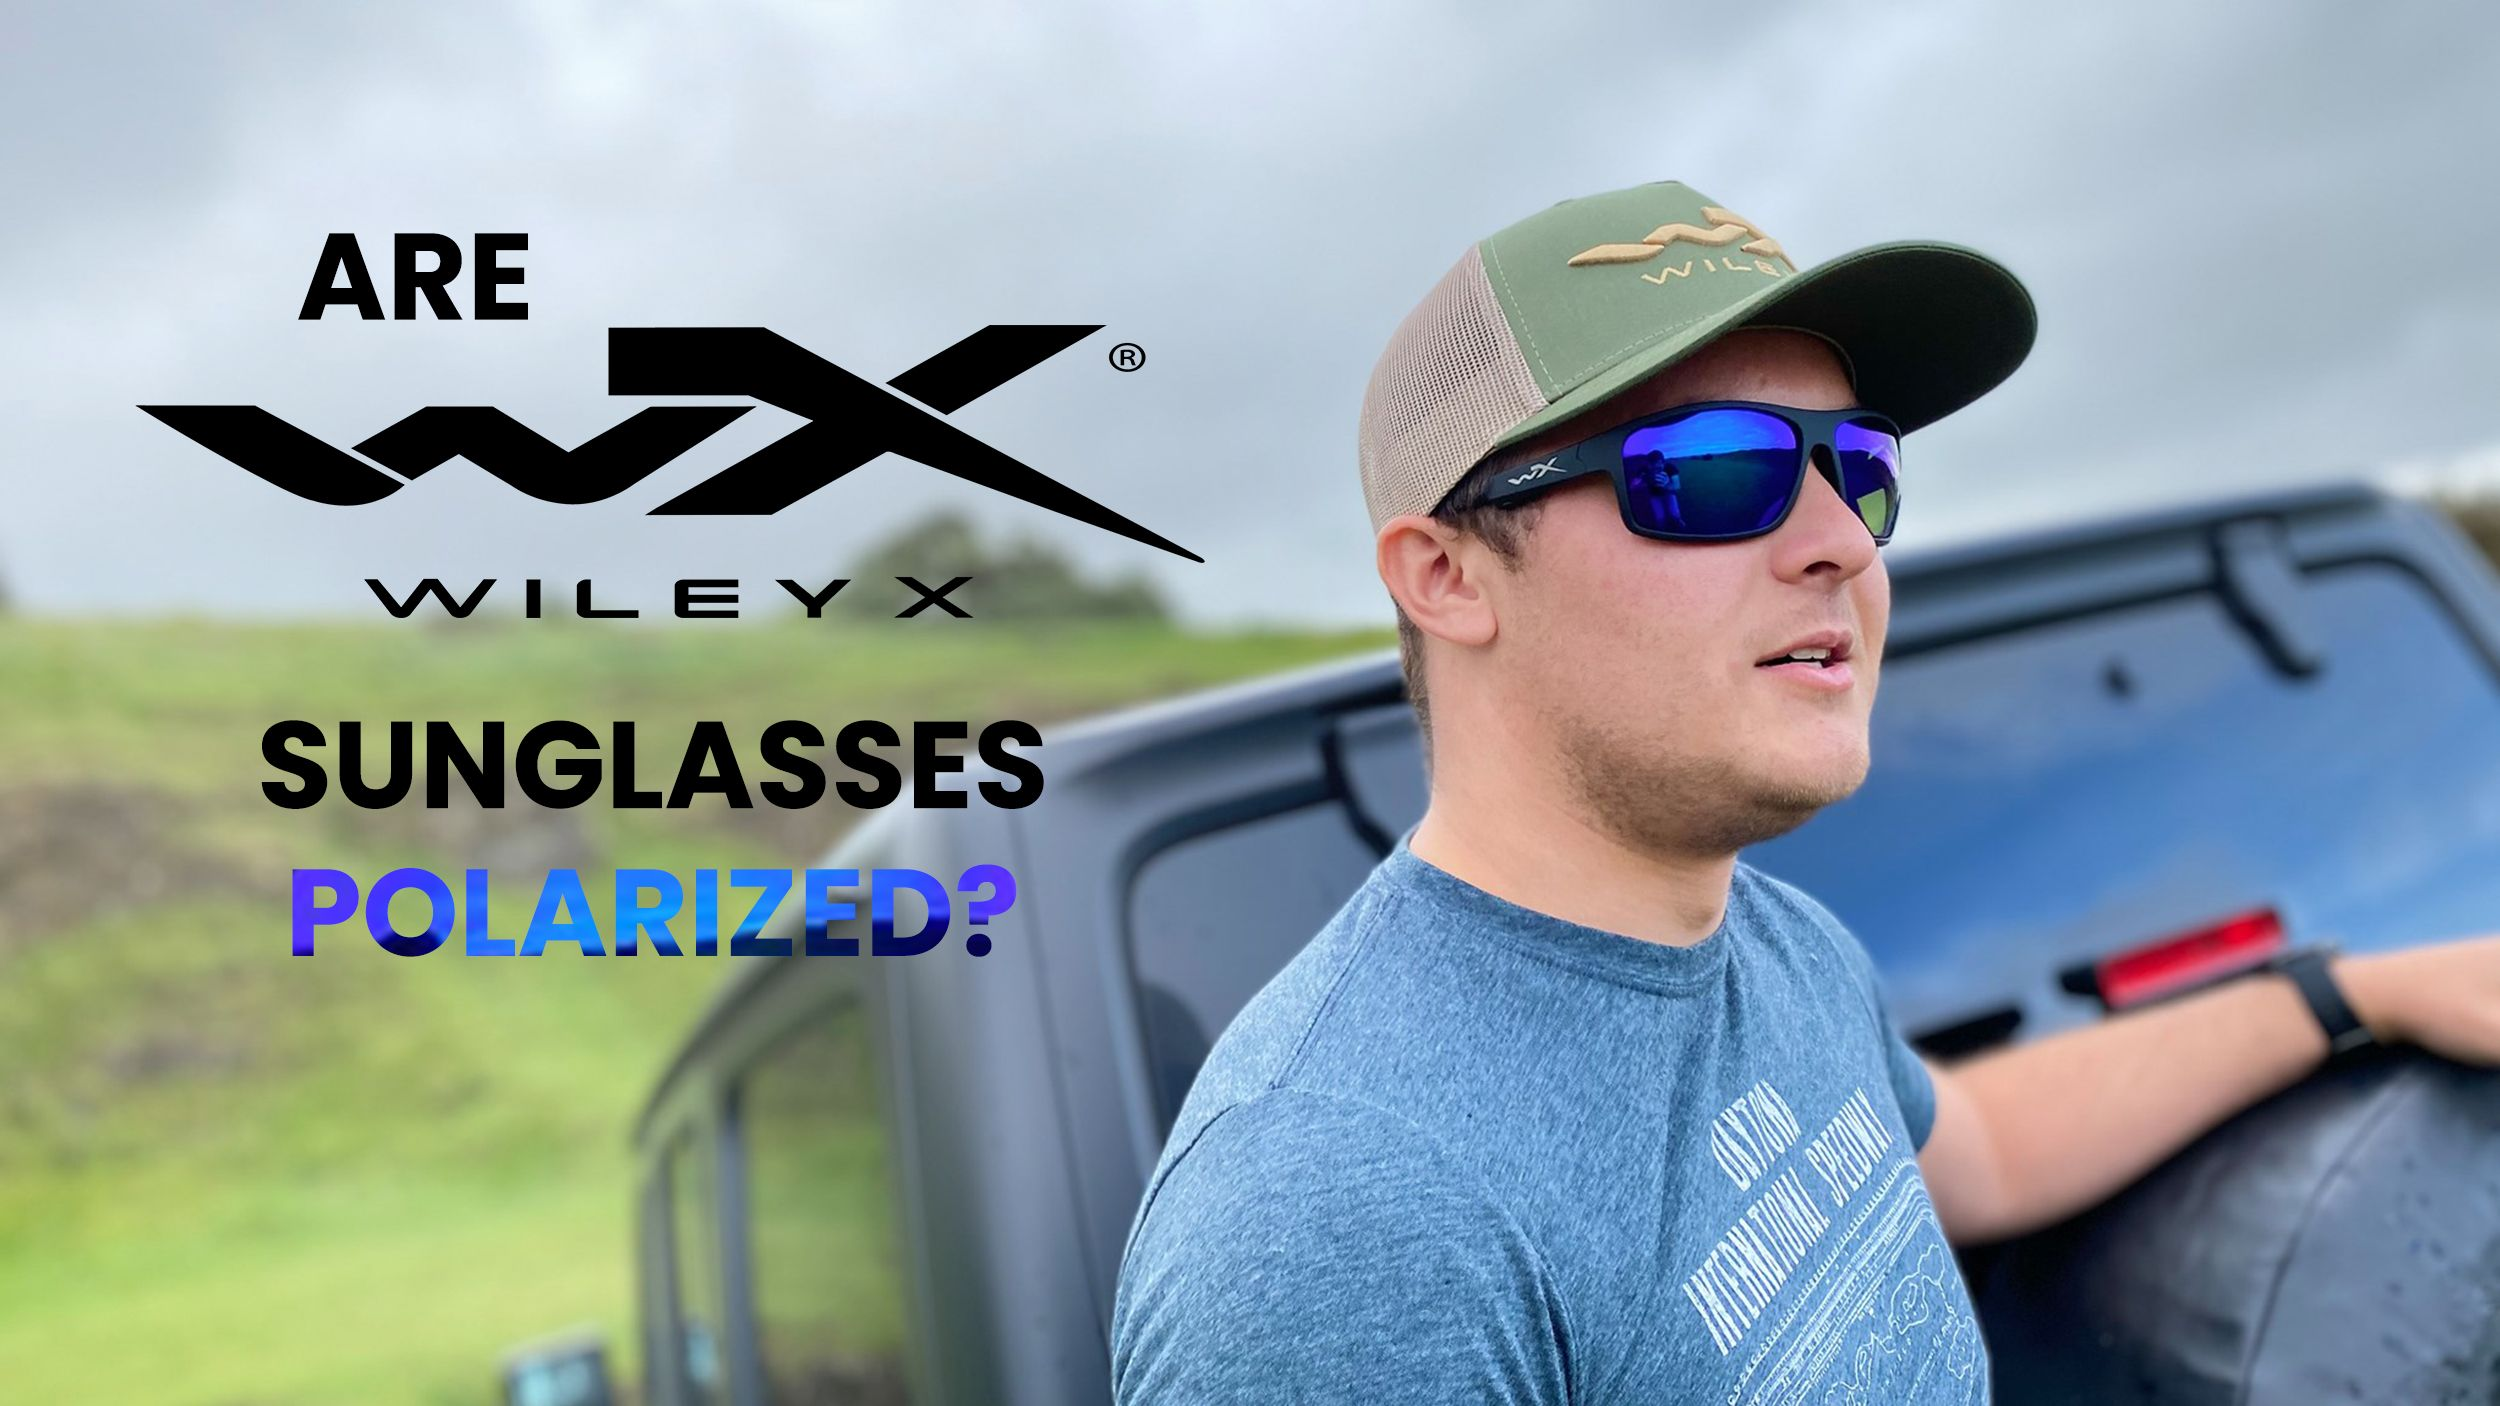 Wiley X Sunglasses Header